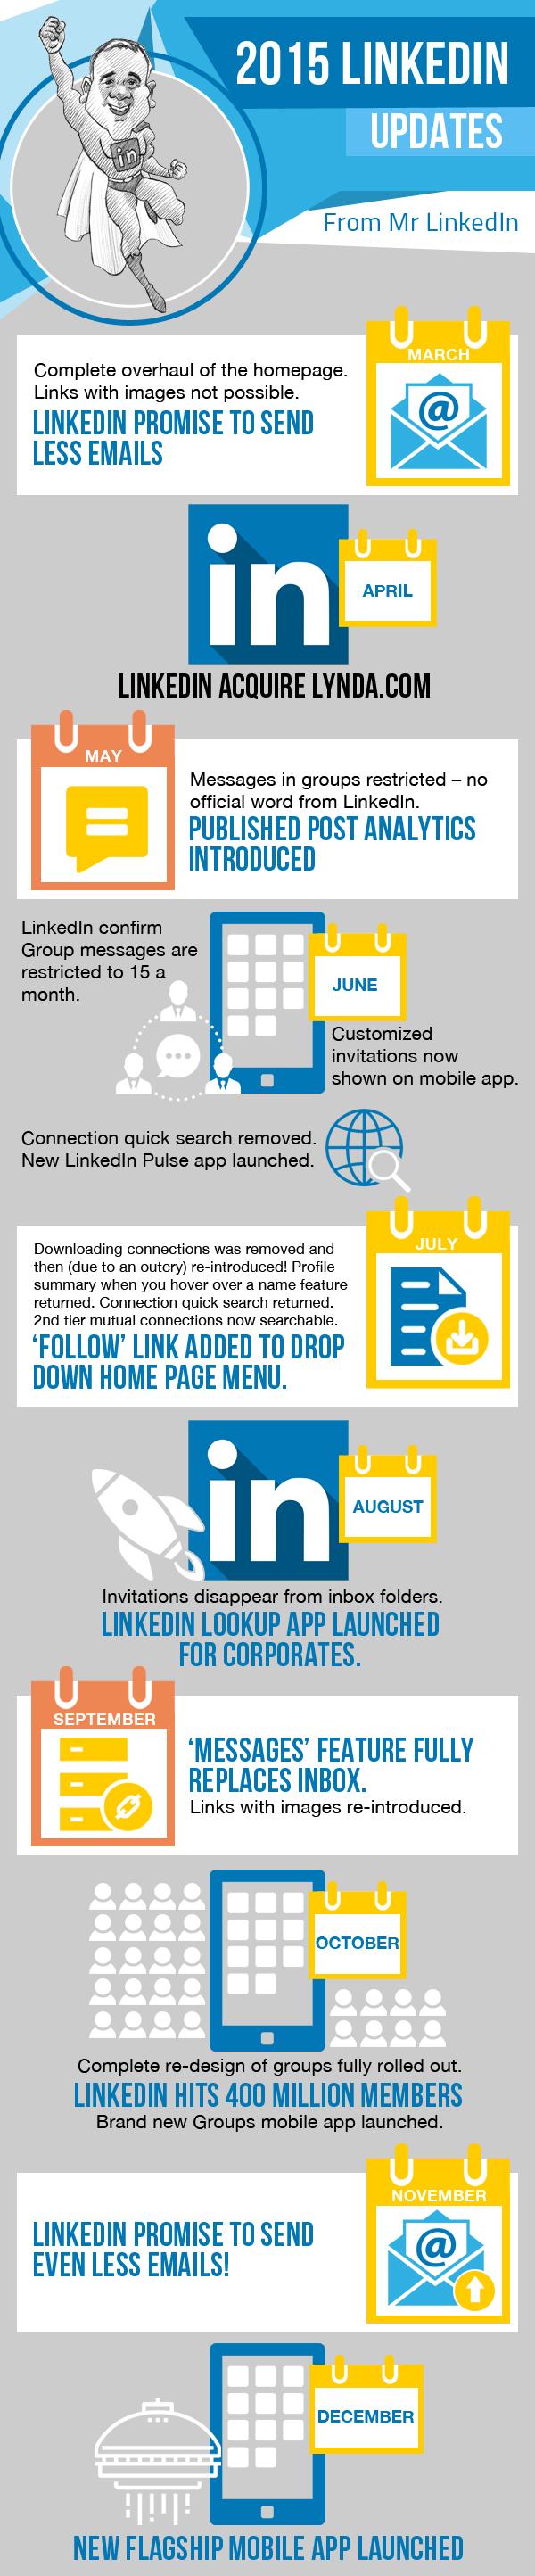 2015_LinkedIn_Updates.jpg